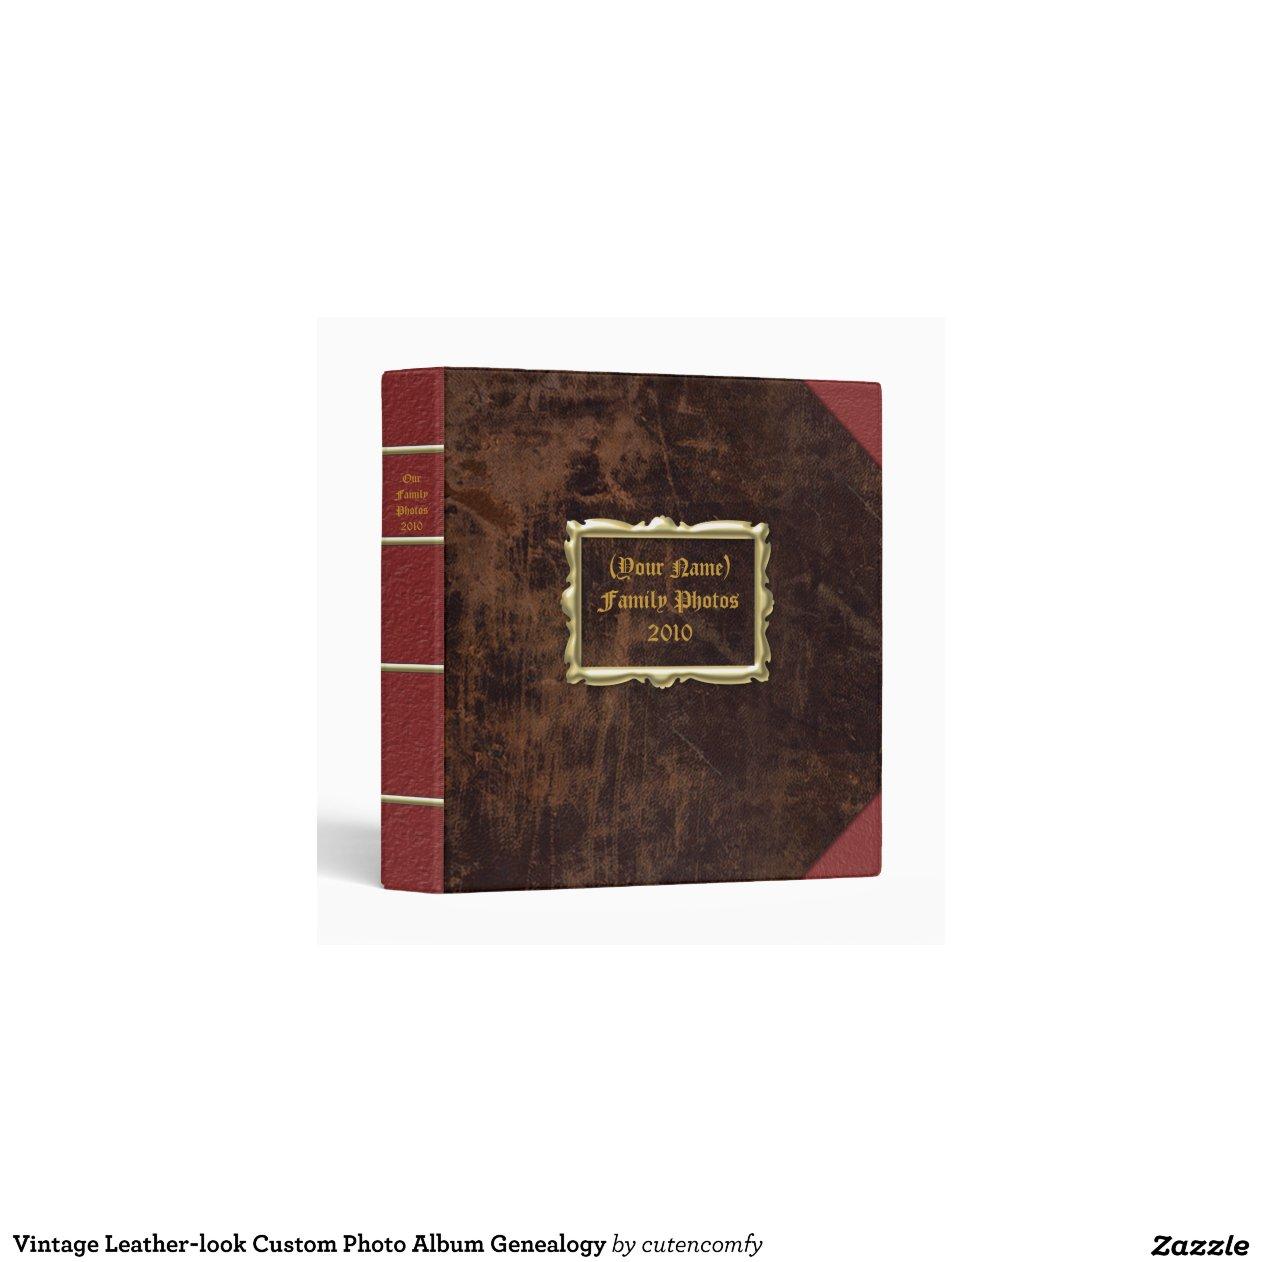 Vintage leather look custom photo album genealogy vinyl for Ka che vintage look